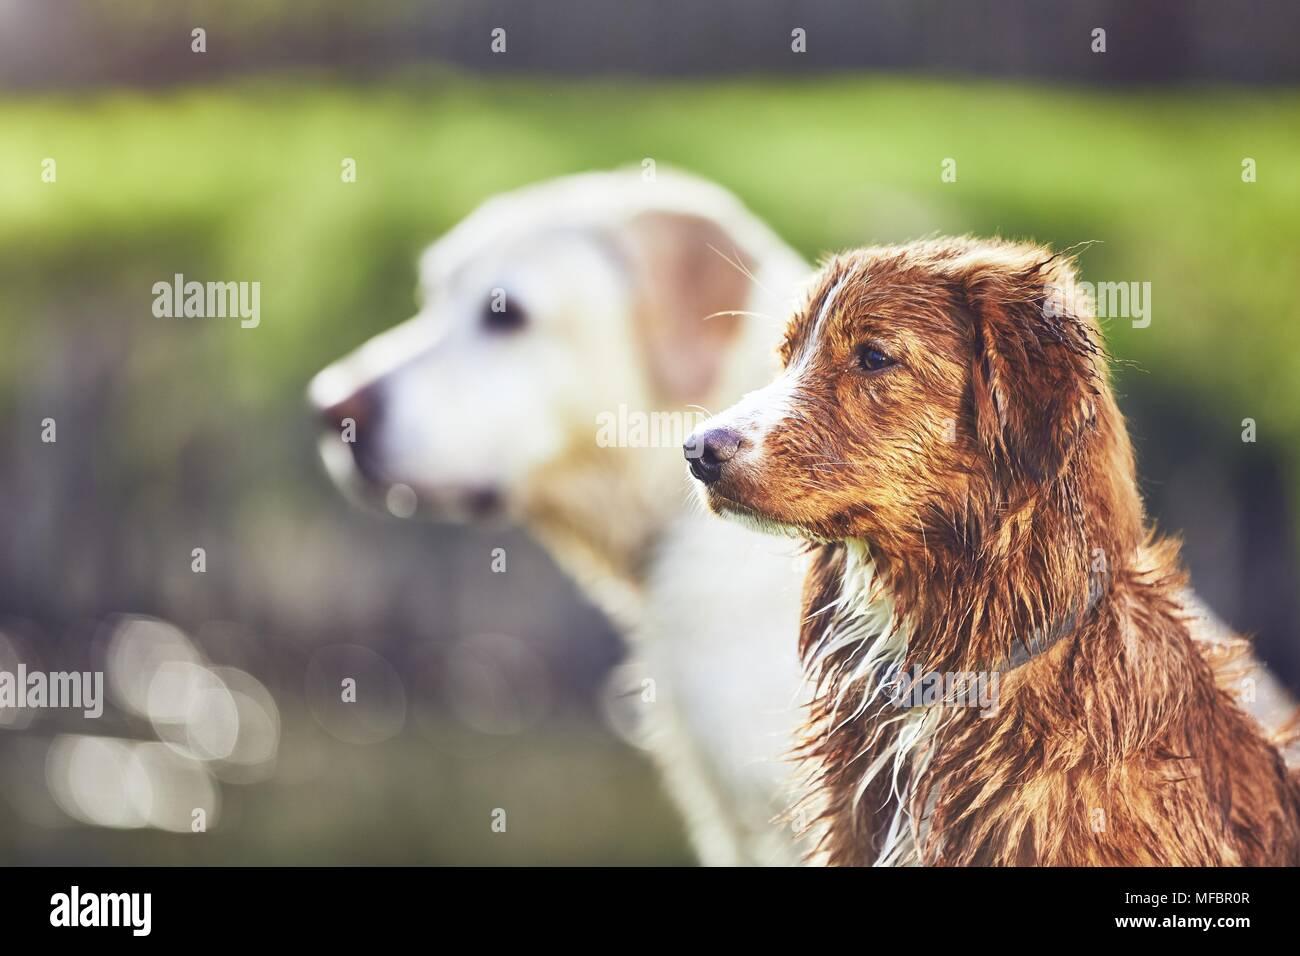 319e4224d9768 Two friendly dogs in summer nature. Labrador Retriever and Nova Scotia Duck  Tolling Retriever sitting